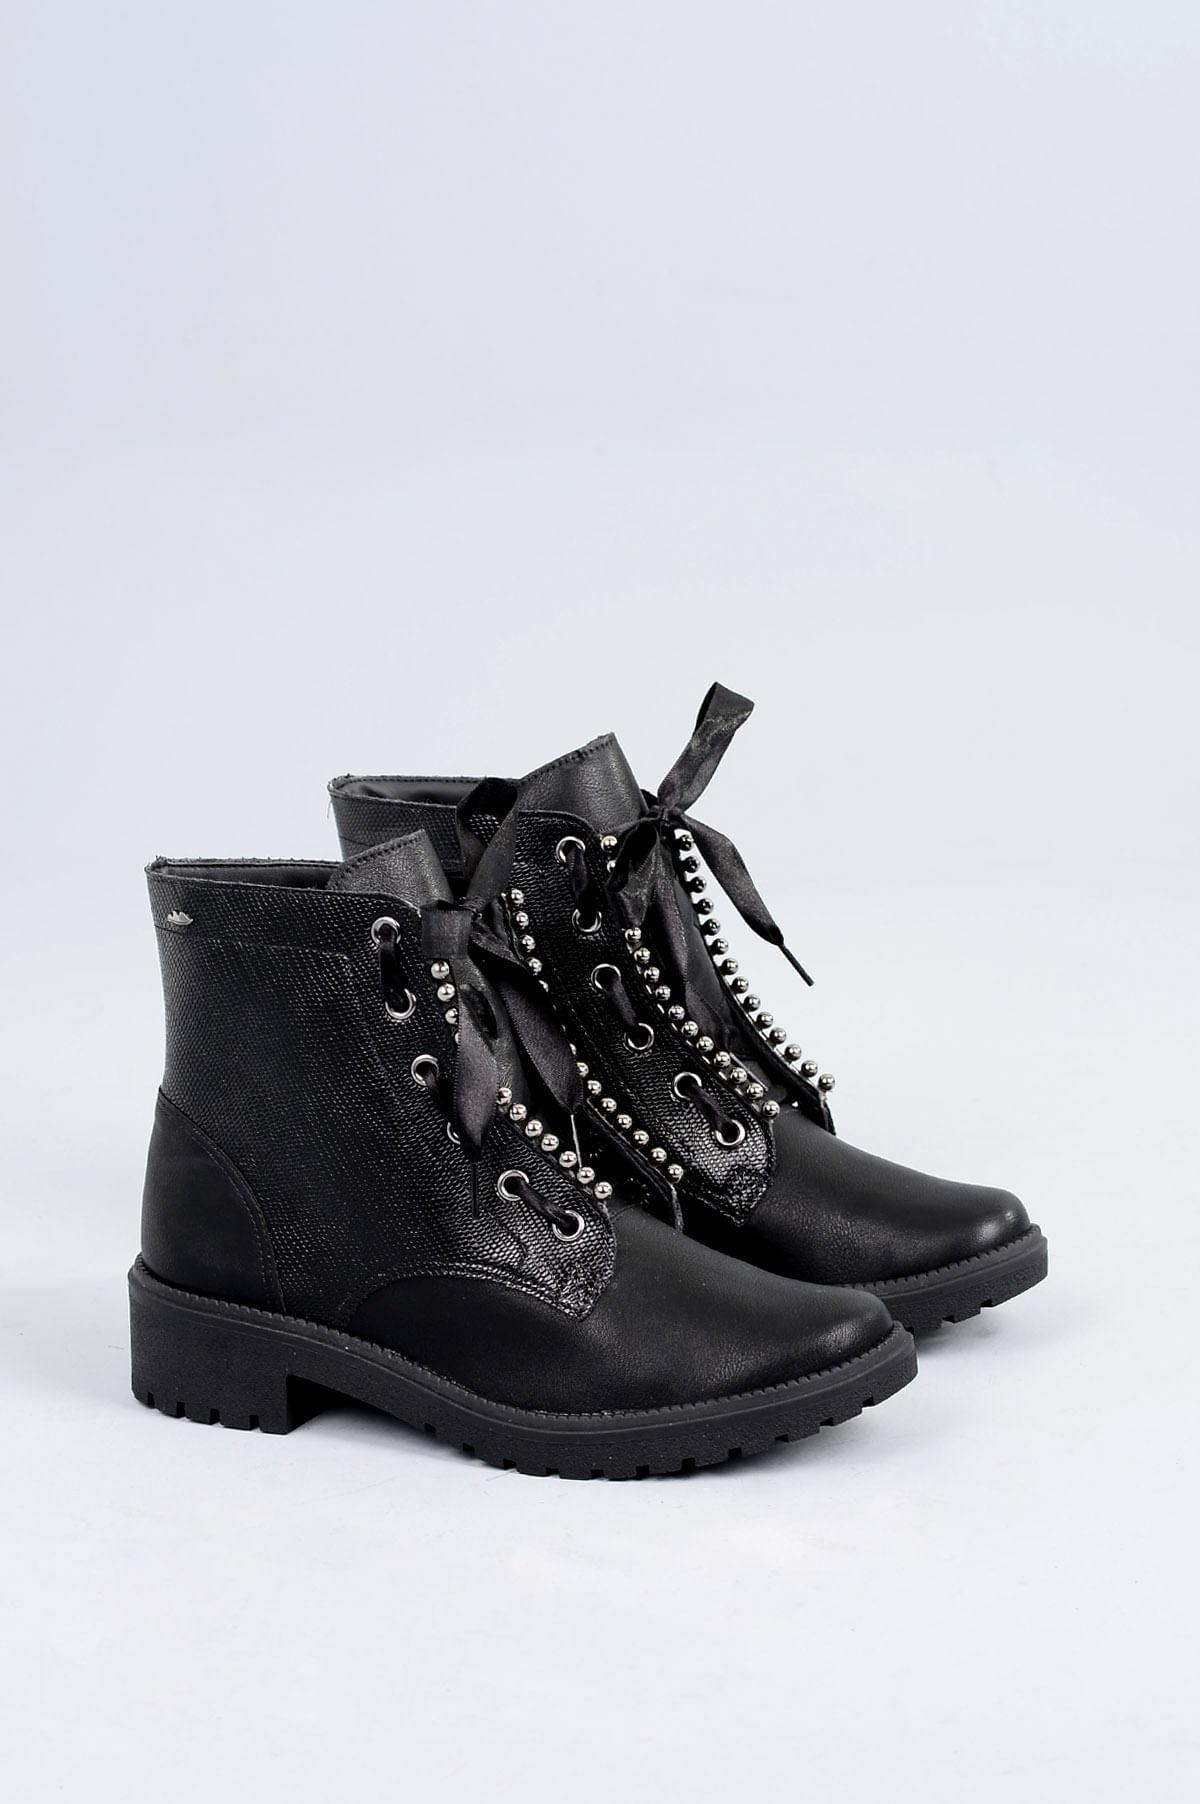 d995d0ca8a Bota Coturno Telmy Dakota SINT - PRETO - Mundial Calçados